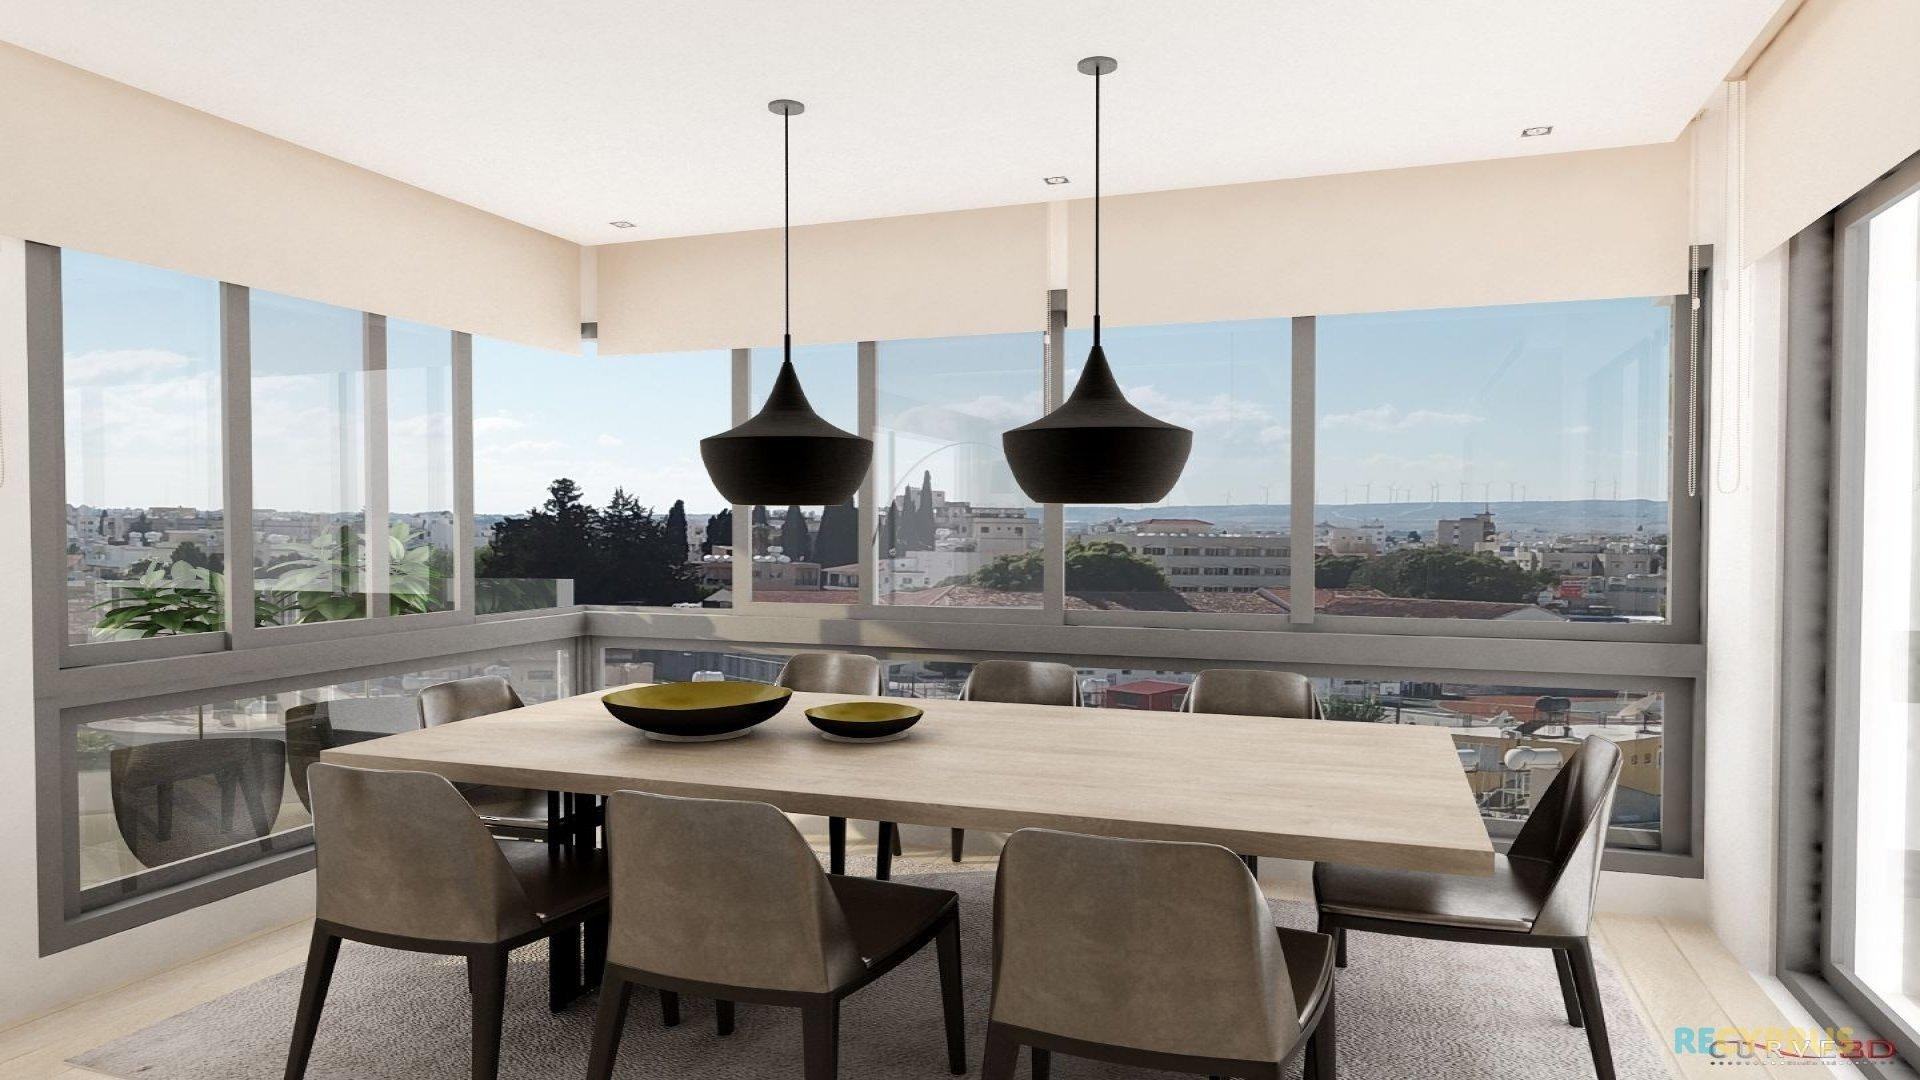 Apartment for sale City Center Larnaca Cyprus 10 3598